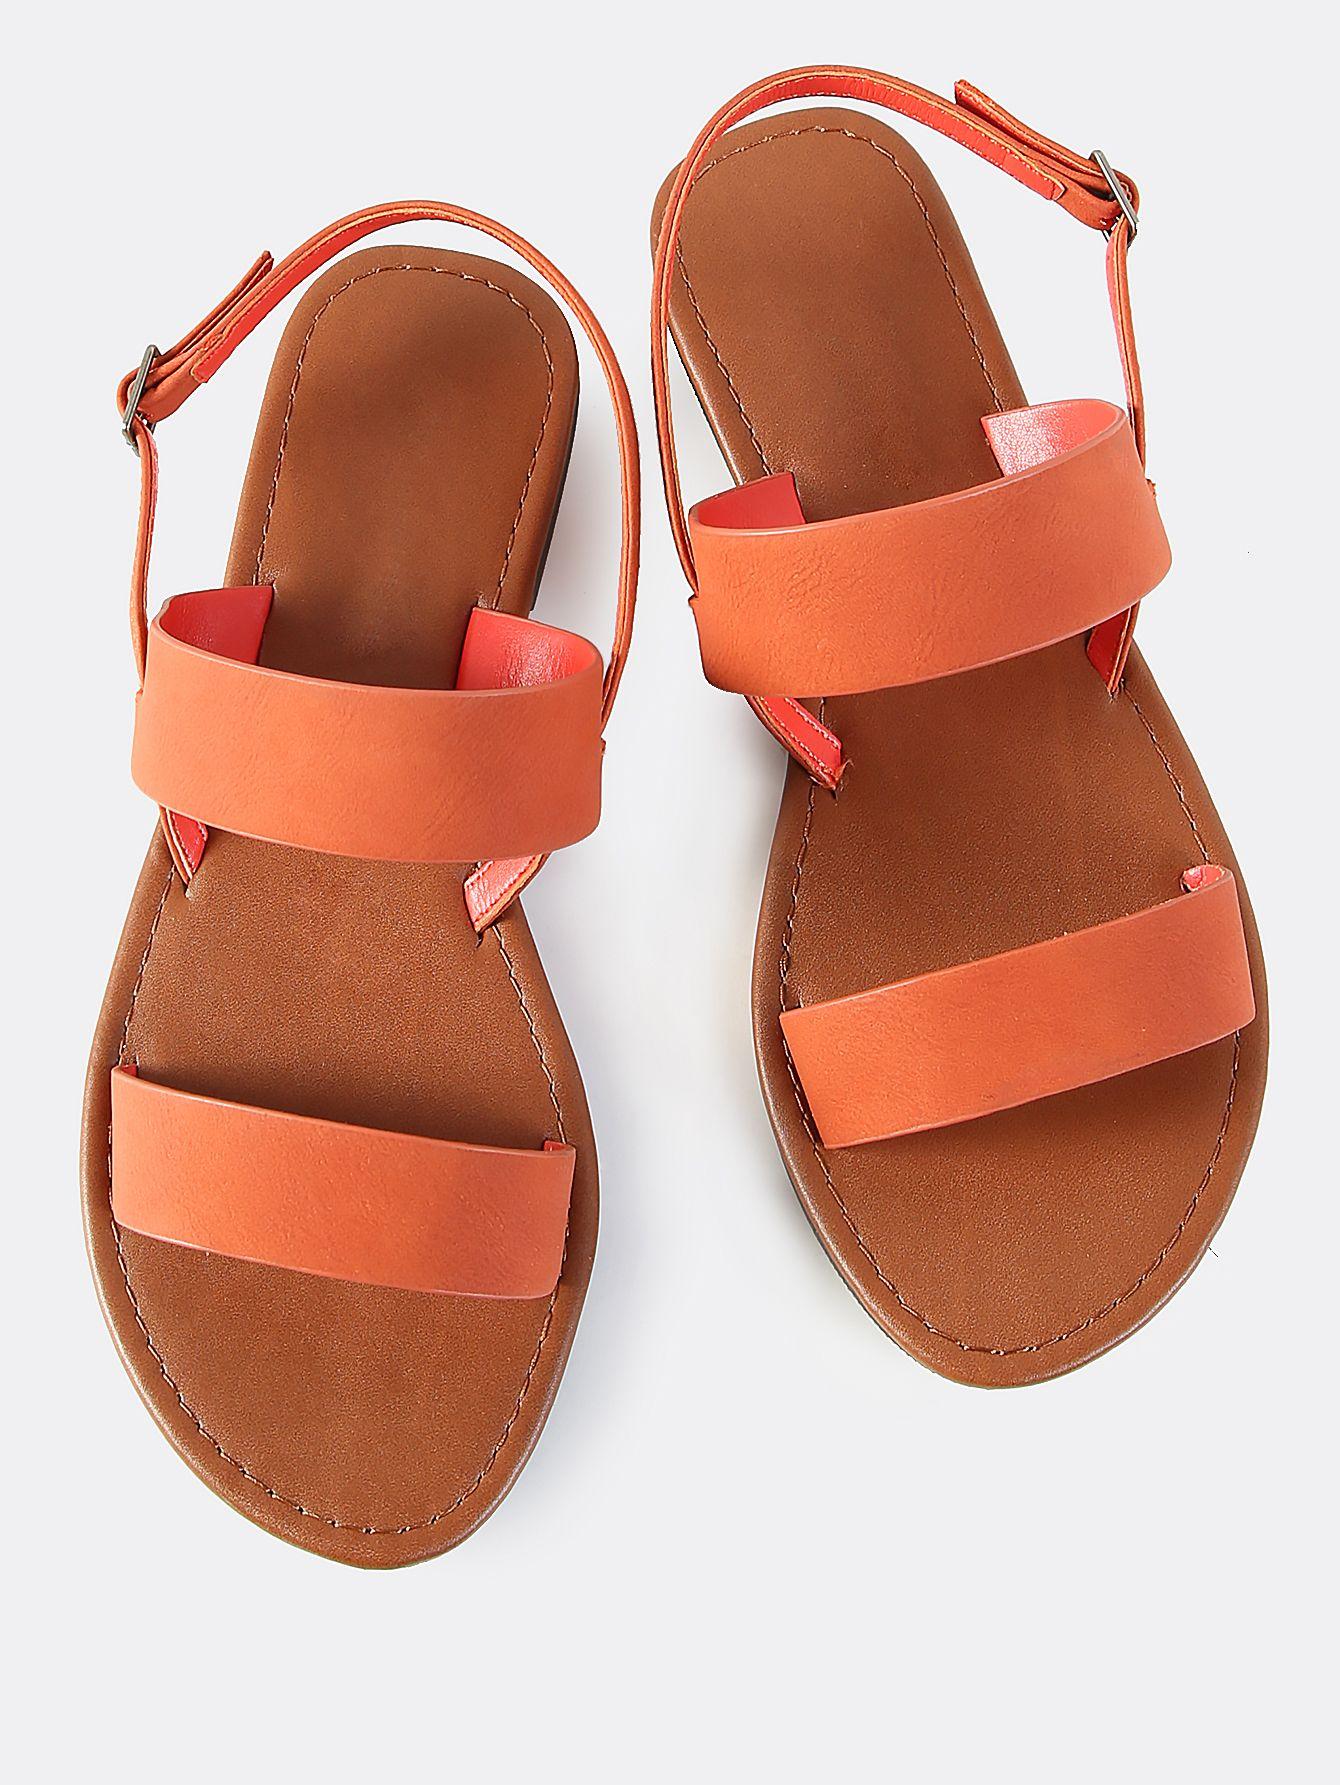 dd4d5786e7bd42 Shop Double Band Faux Leather Sandals BURNT ORANGE online. SheIn offers  Double Band Faux Leather